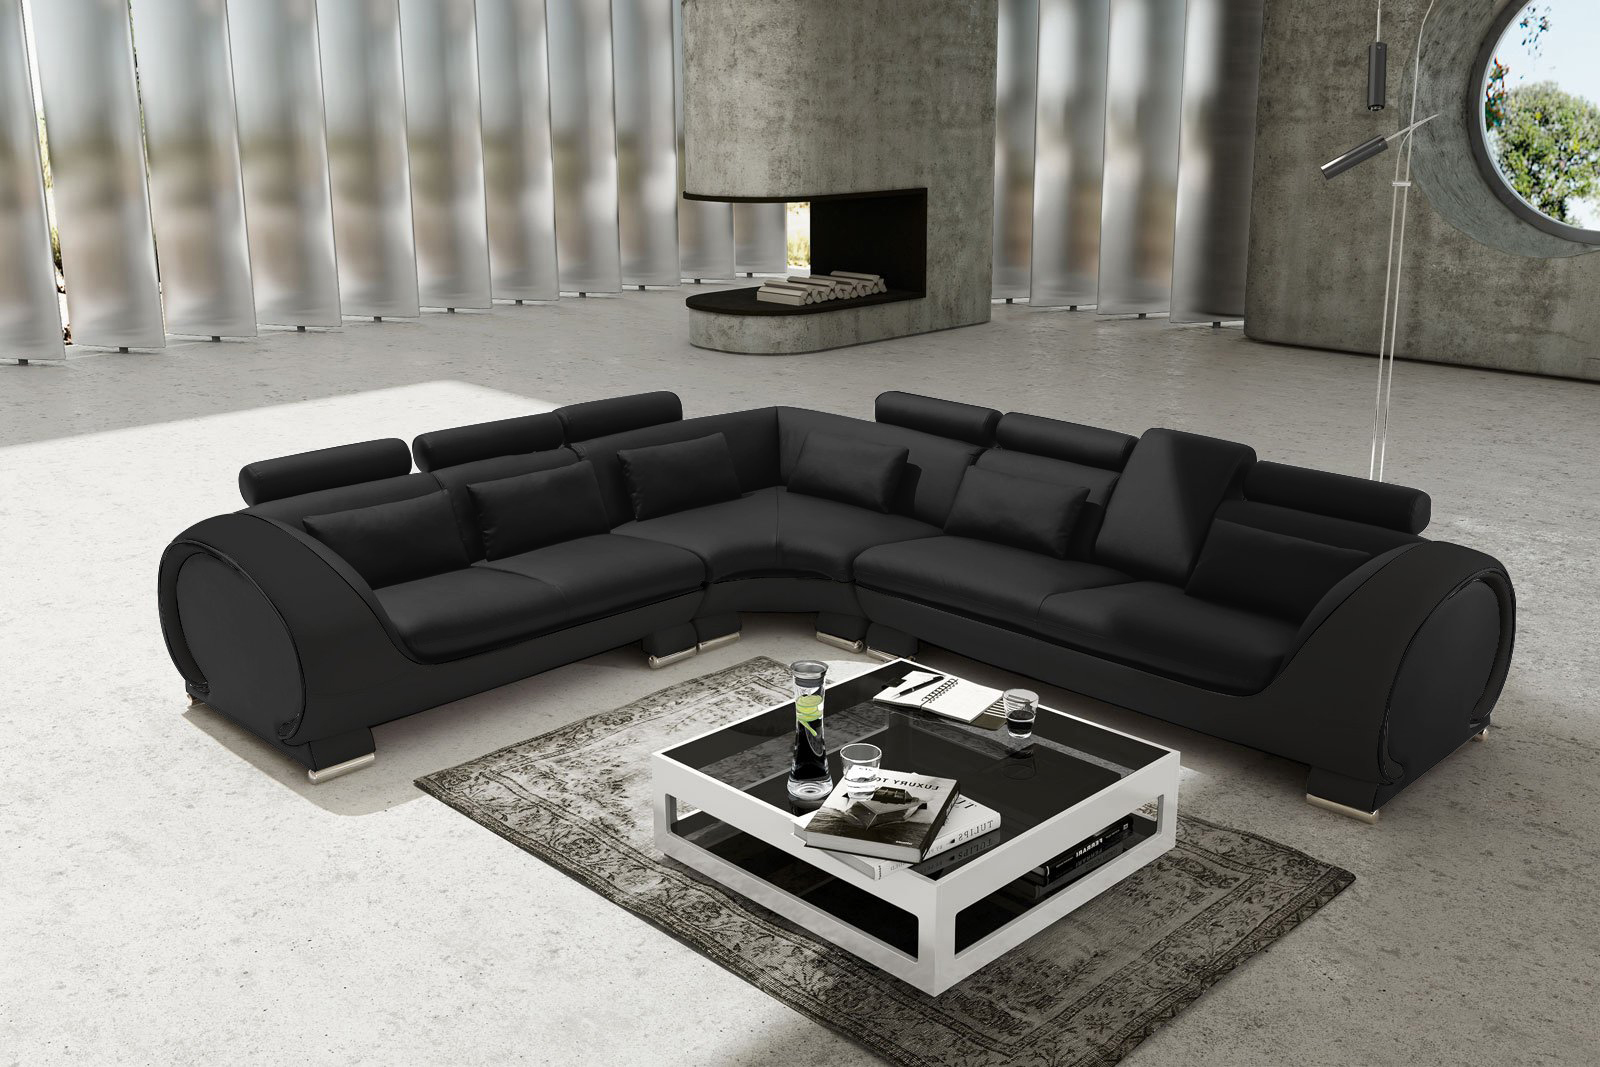 Sofa B Ware Zuhause Image Ideas